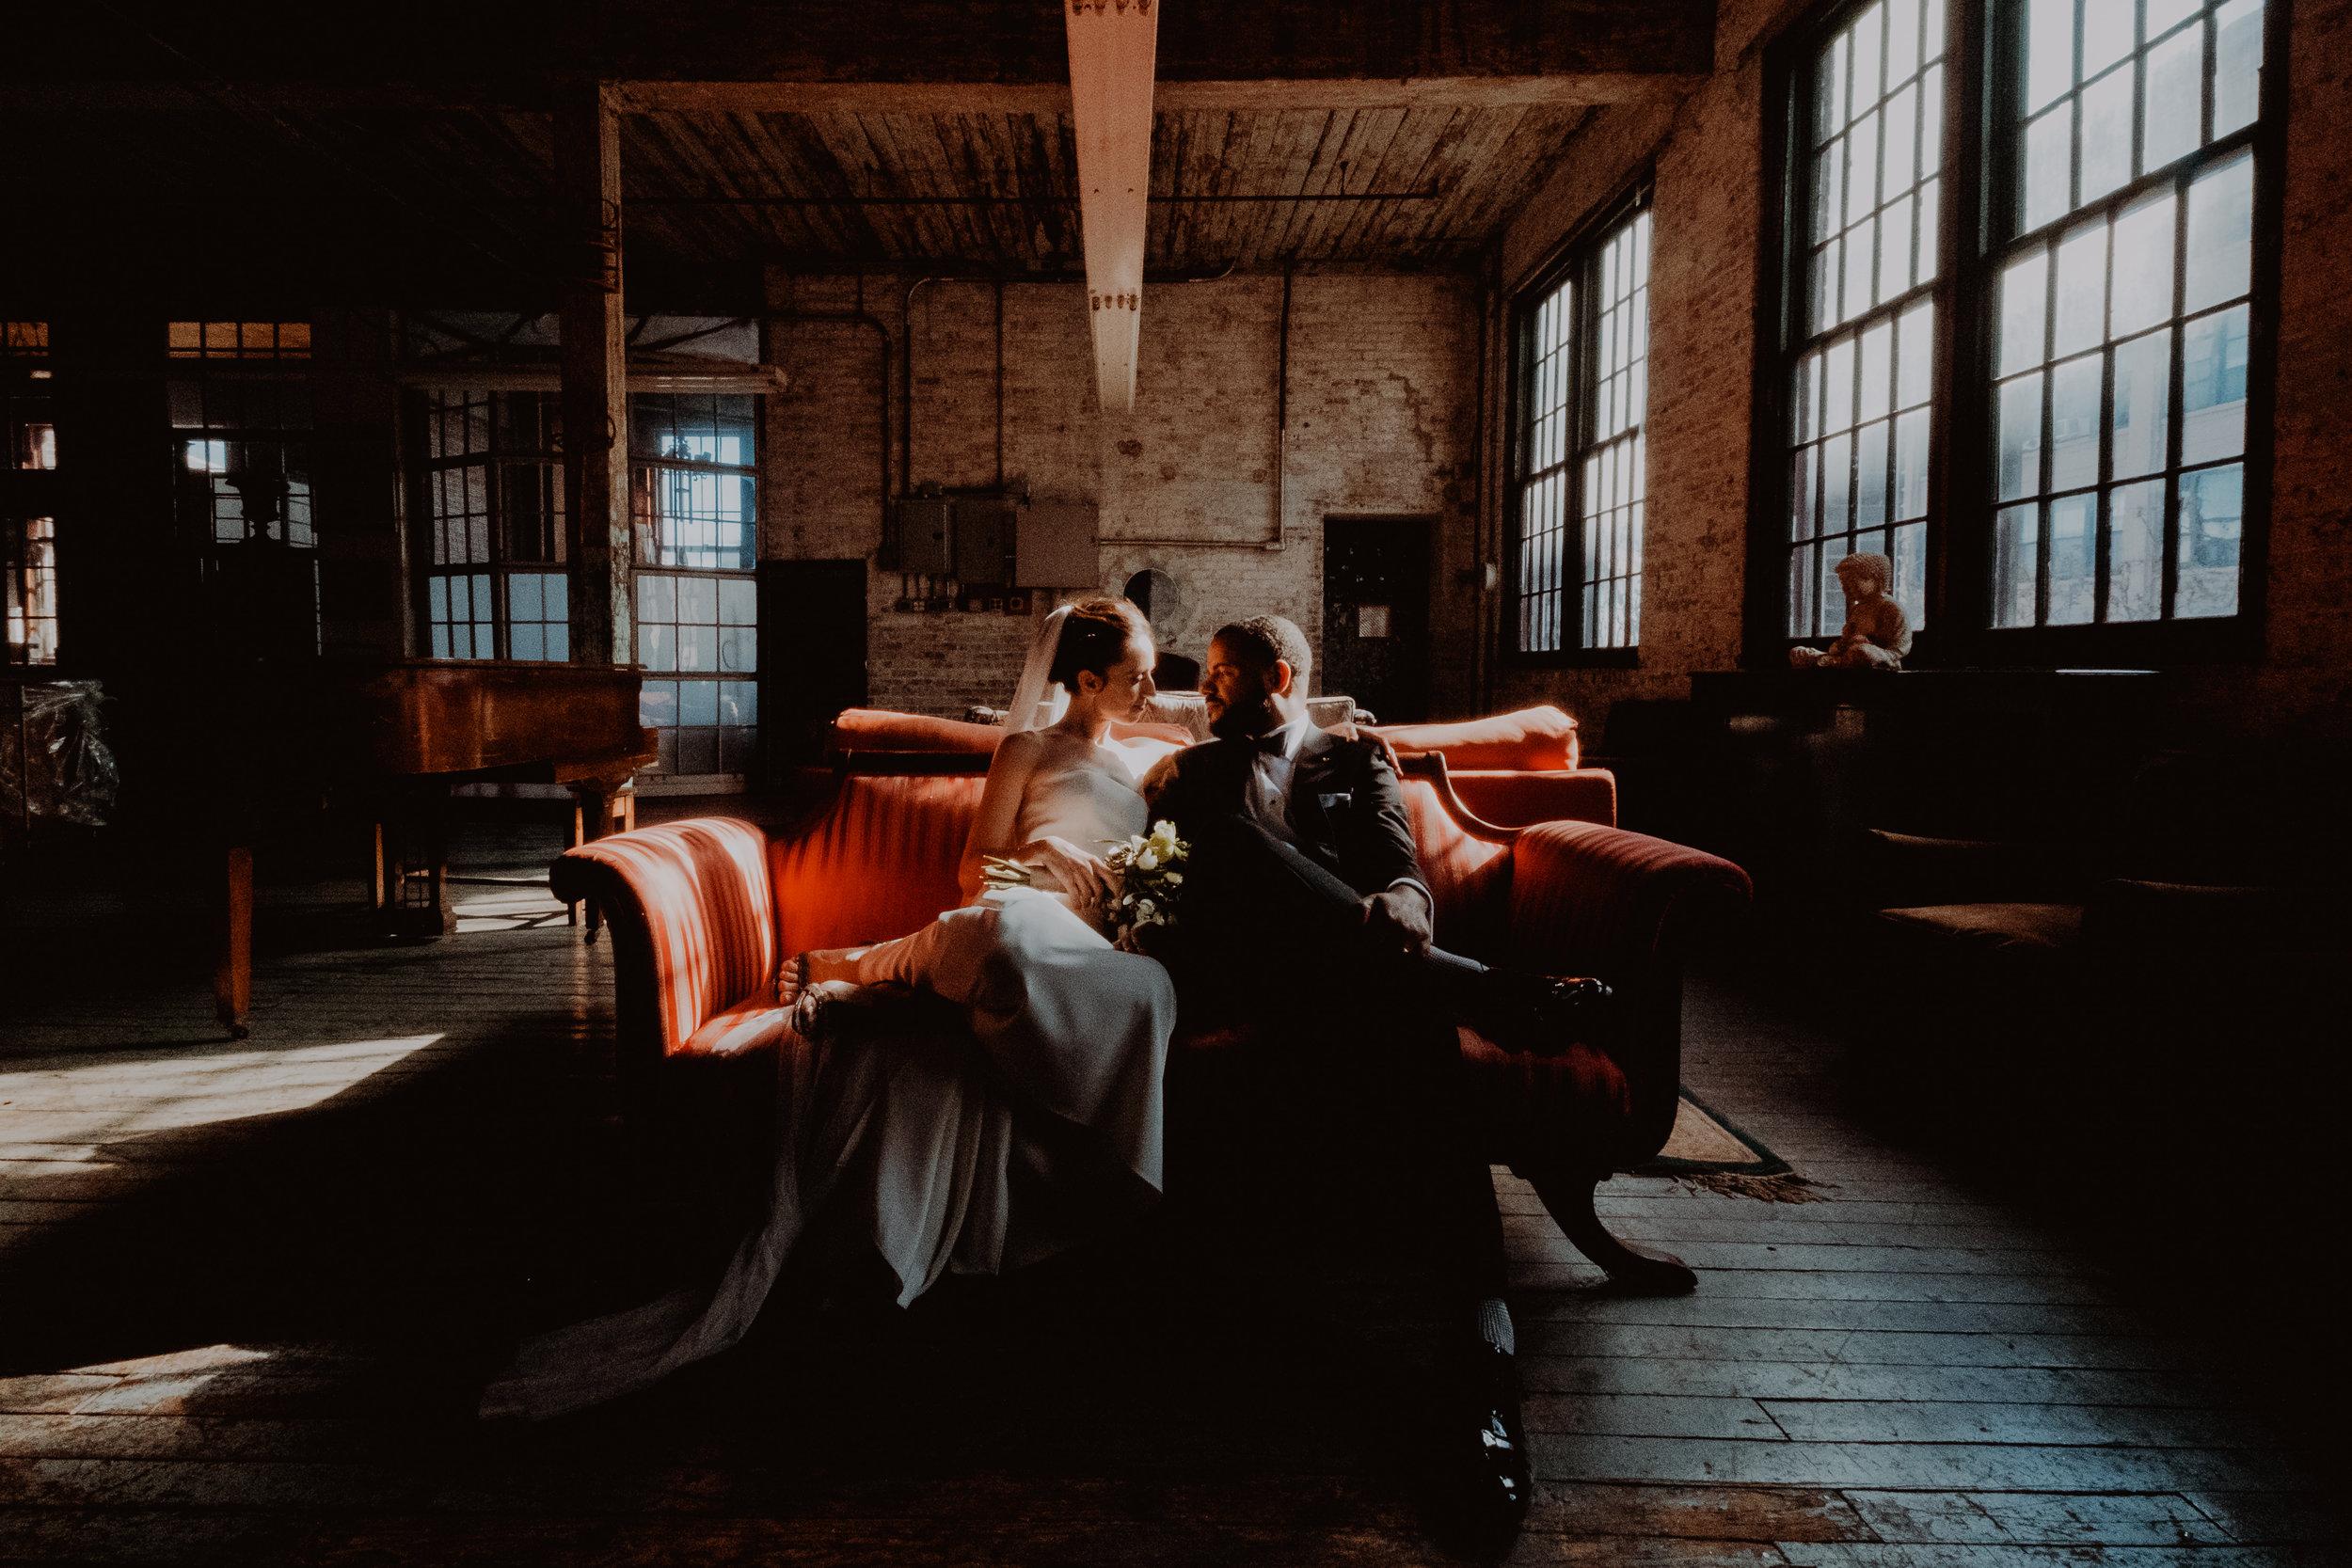 Metropolitan_Building_Wedding_DemaineandMike_Brooklyn_Wedding_Photographer_Chellise_Michael_Photography-370.jpg